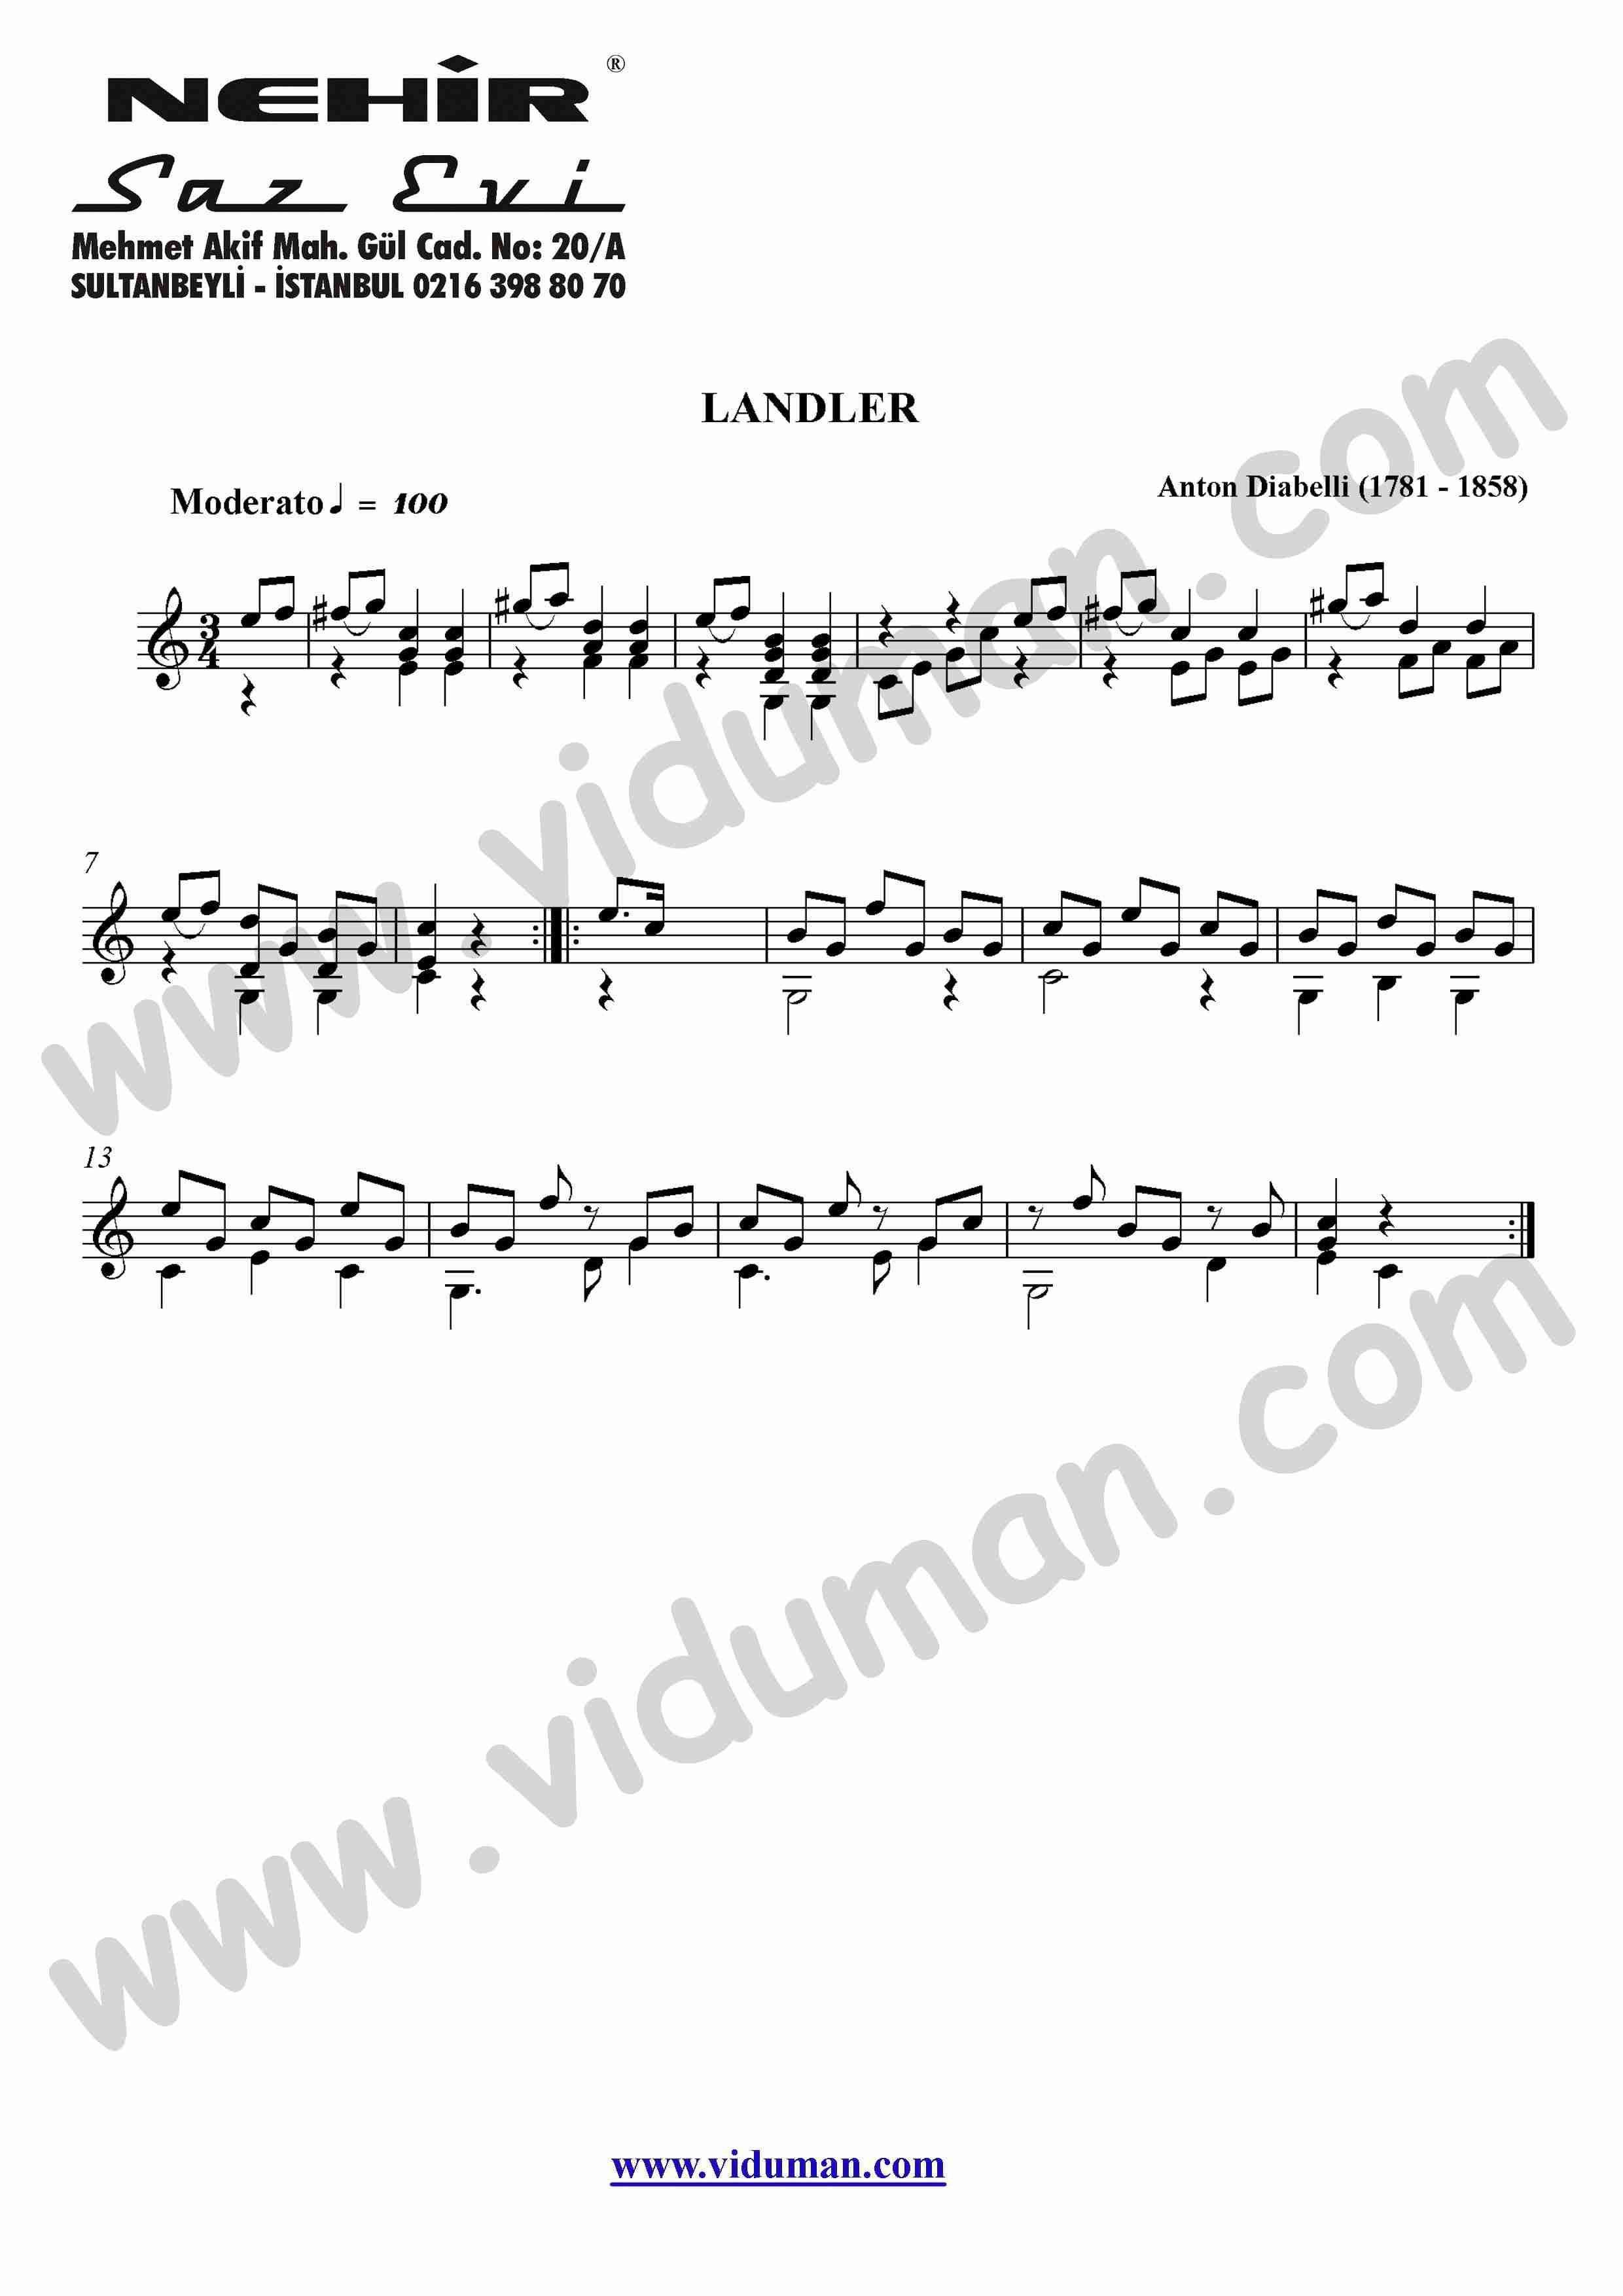 19- Landler (Anton Diabell)